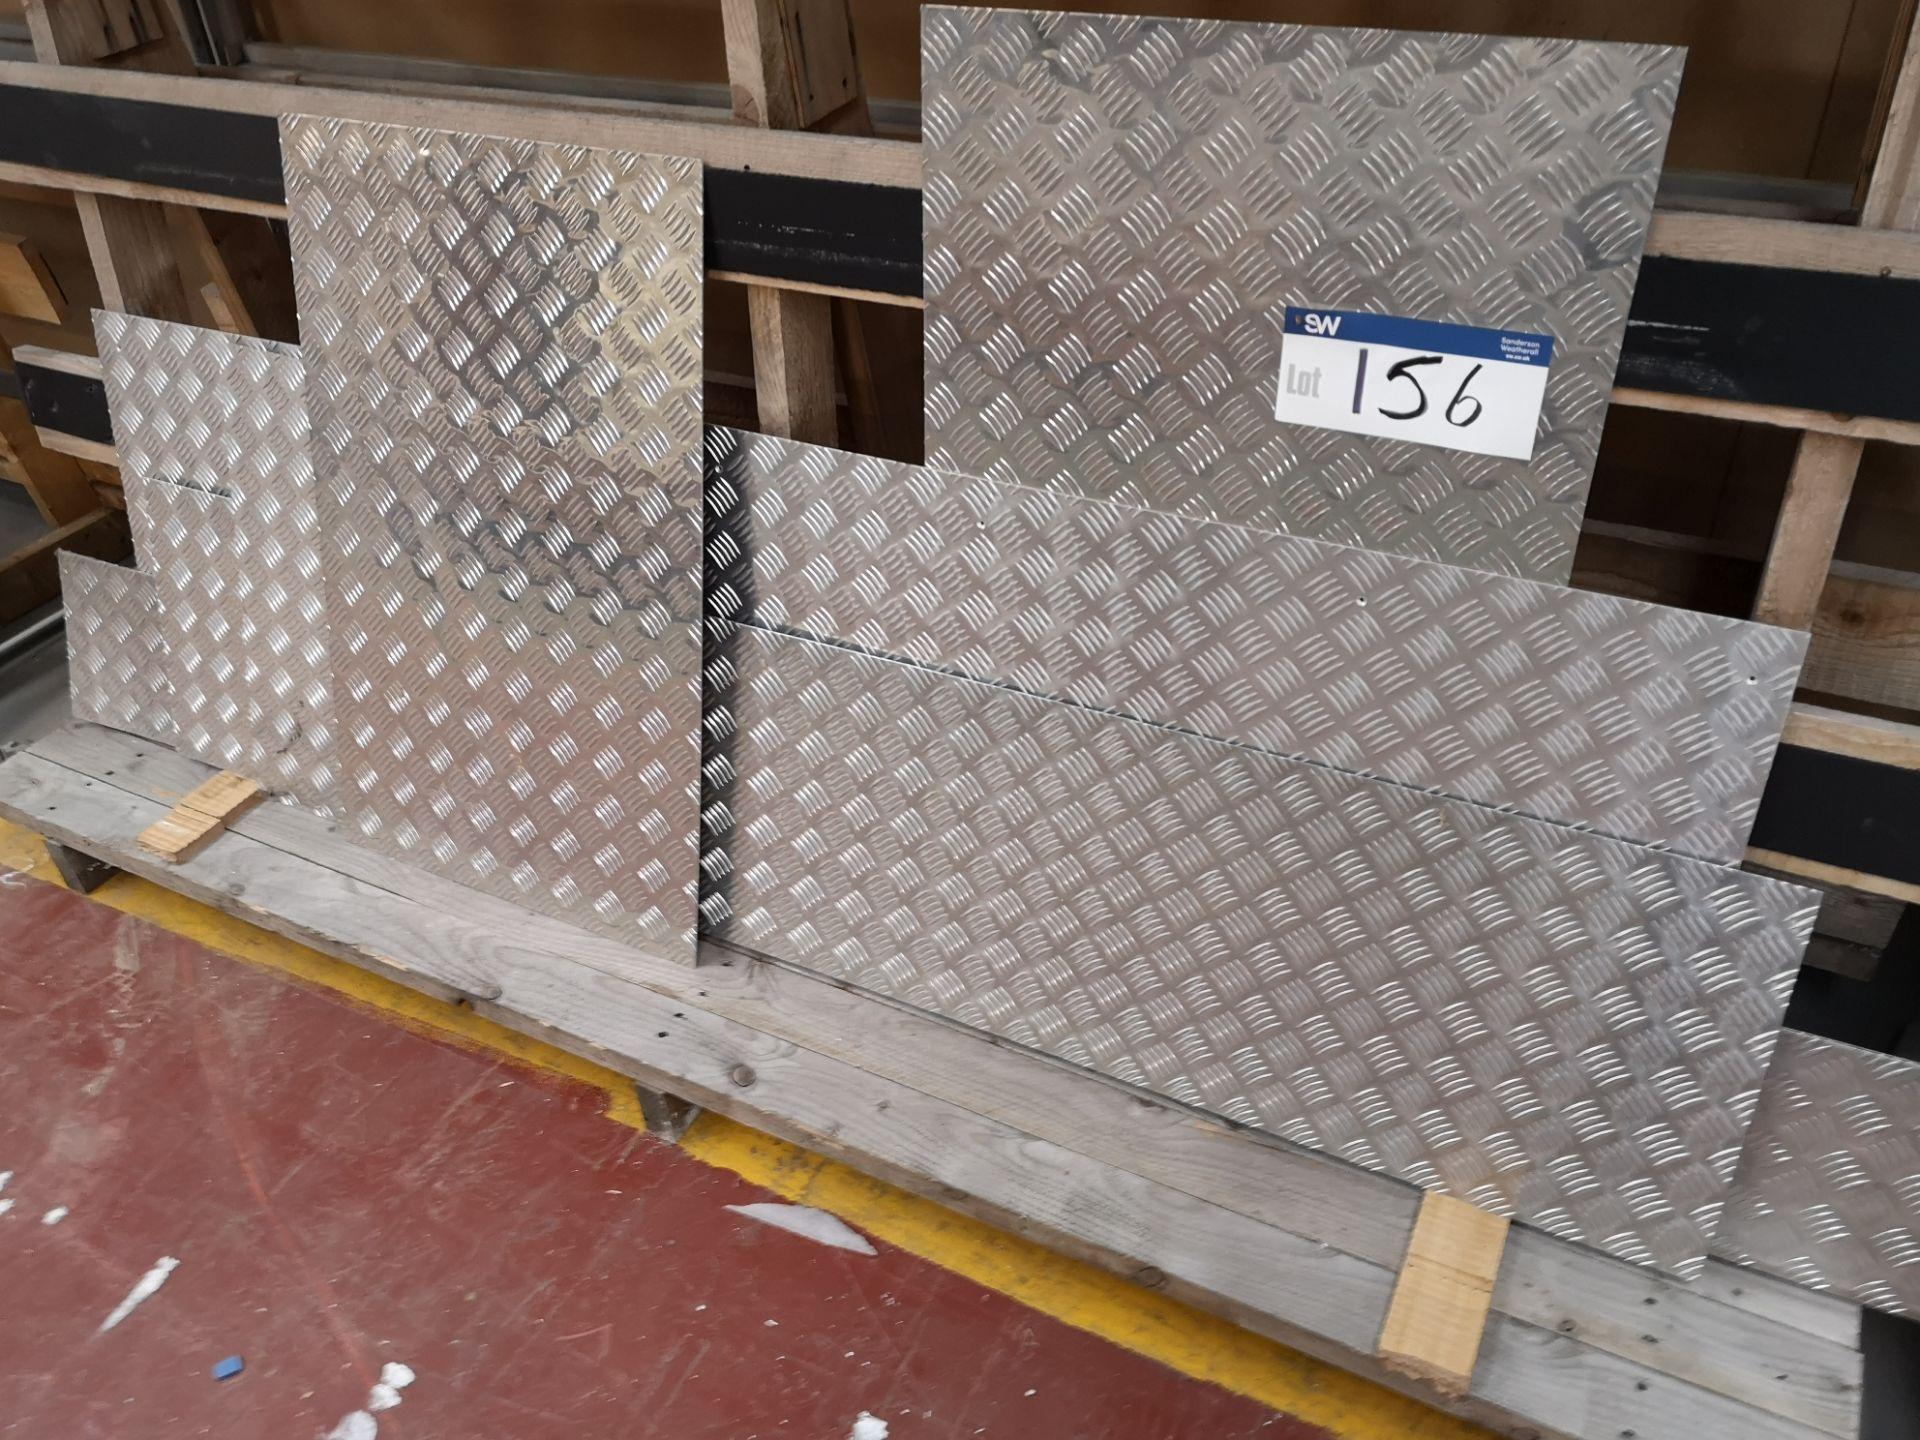 Lot 156 - Quantity of Aluminium Checker Plate